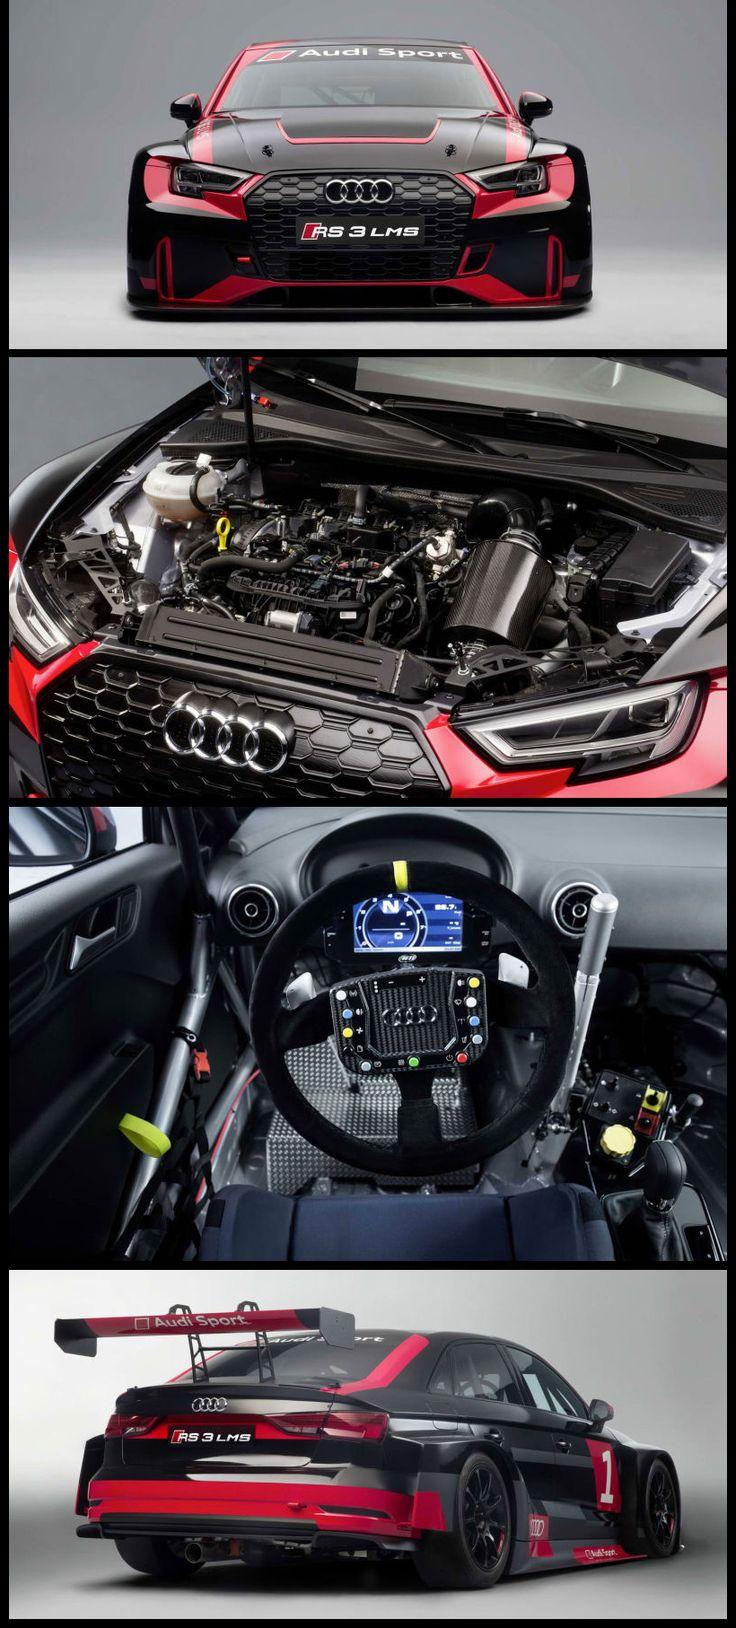 Driving gloves jalopnik - Http Jalopnik Com Audis Rs3 Lms Is